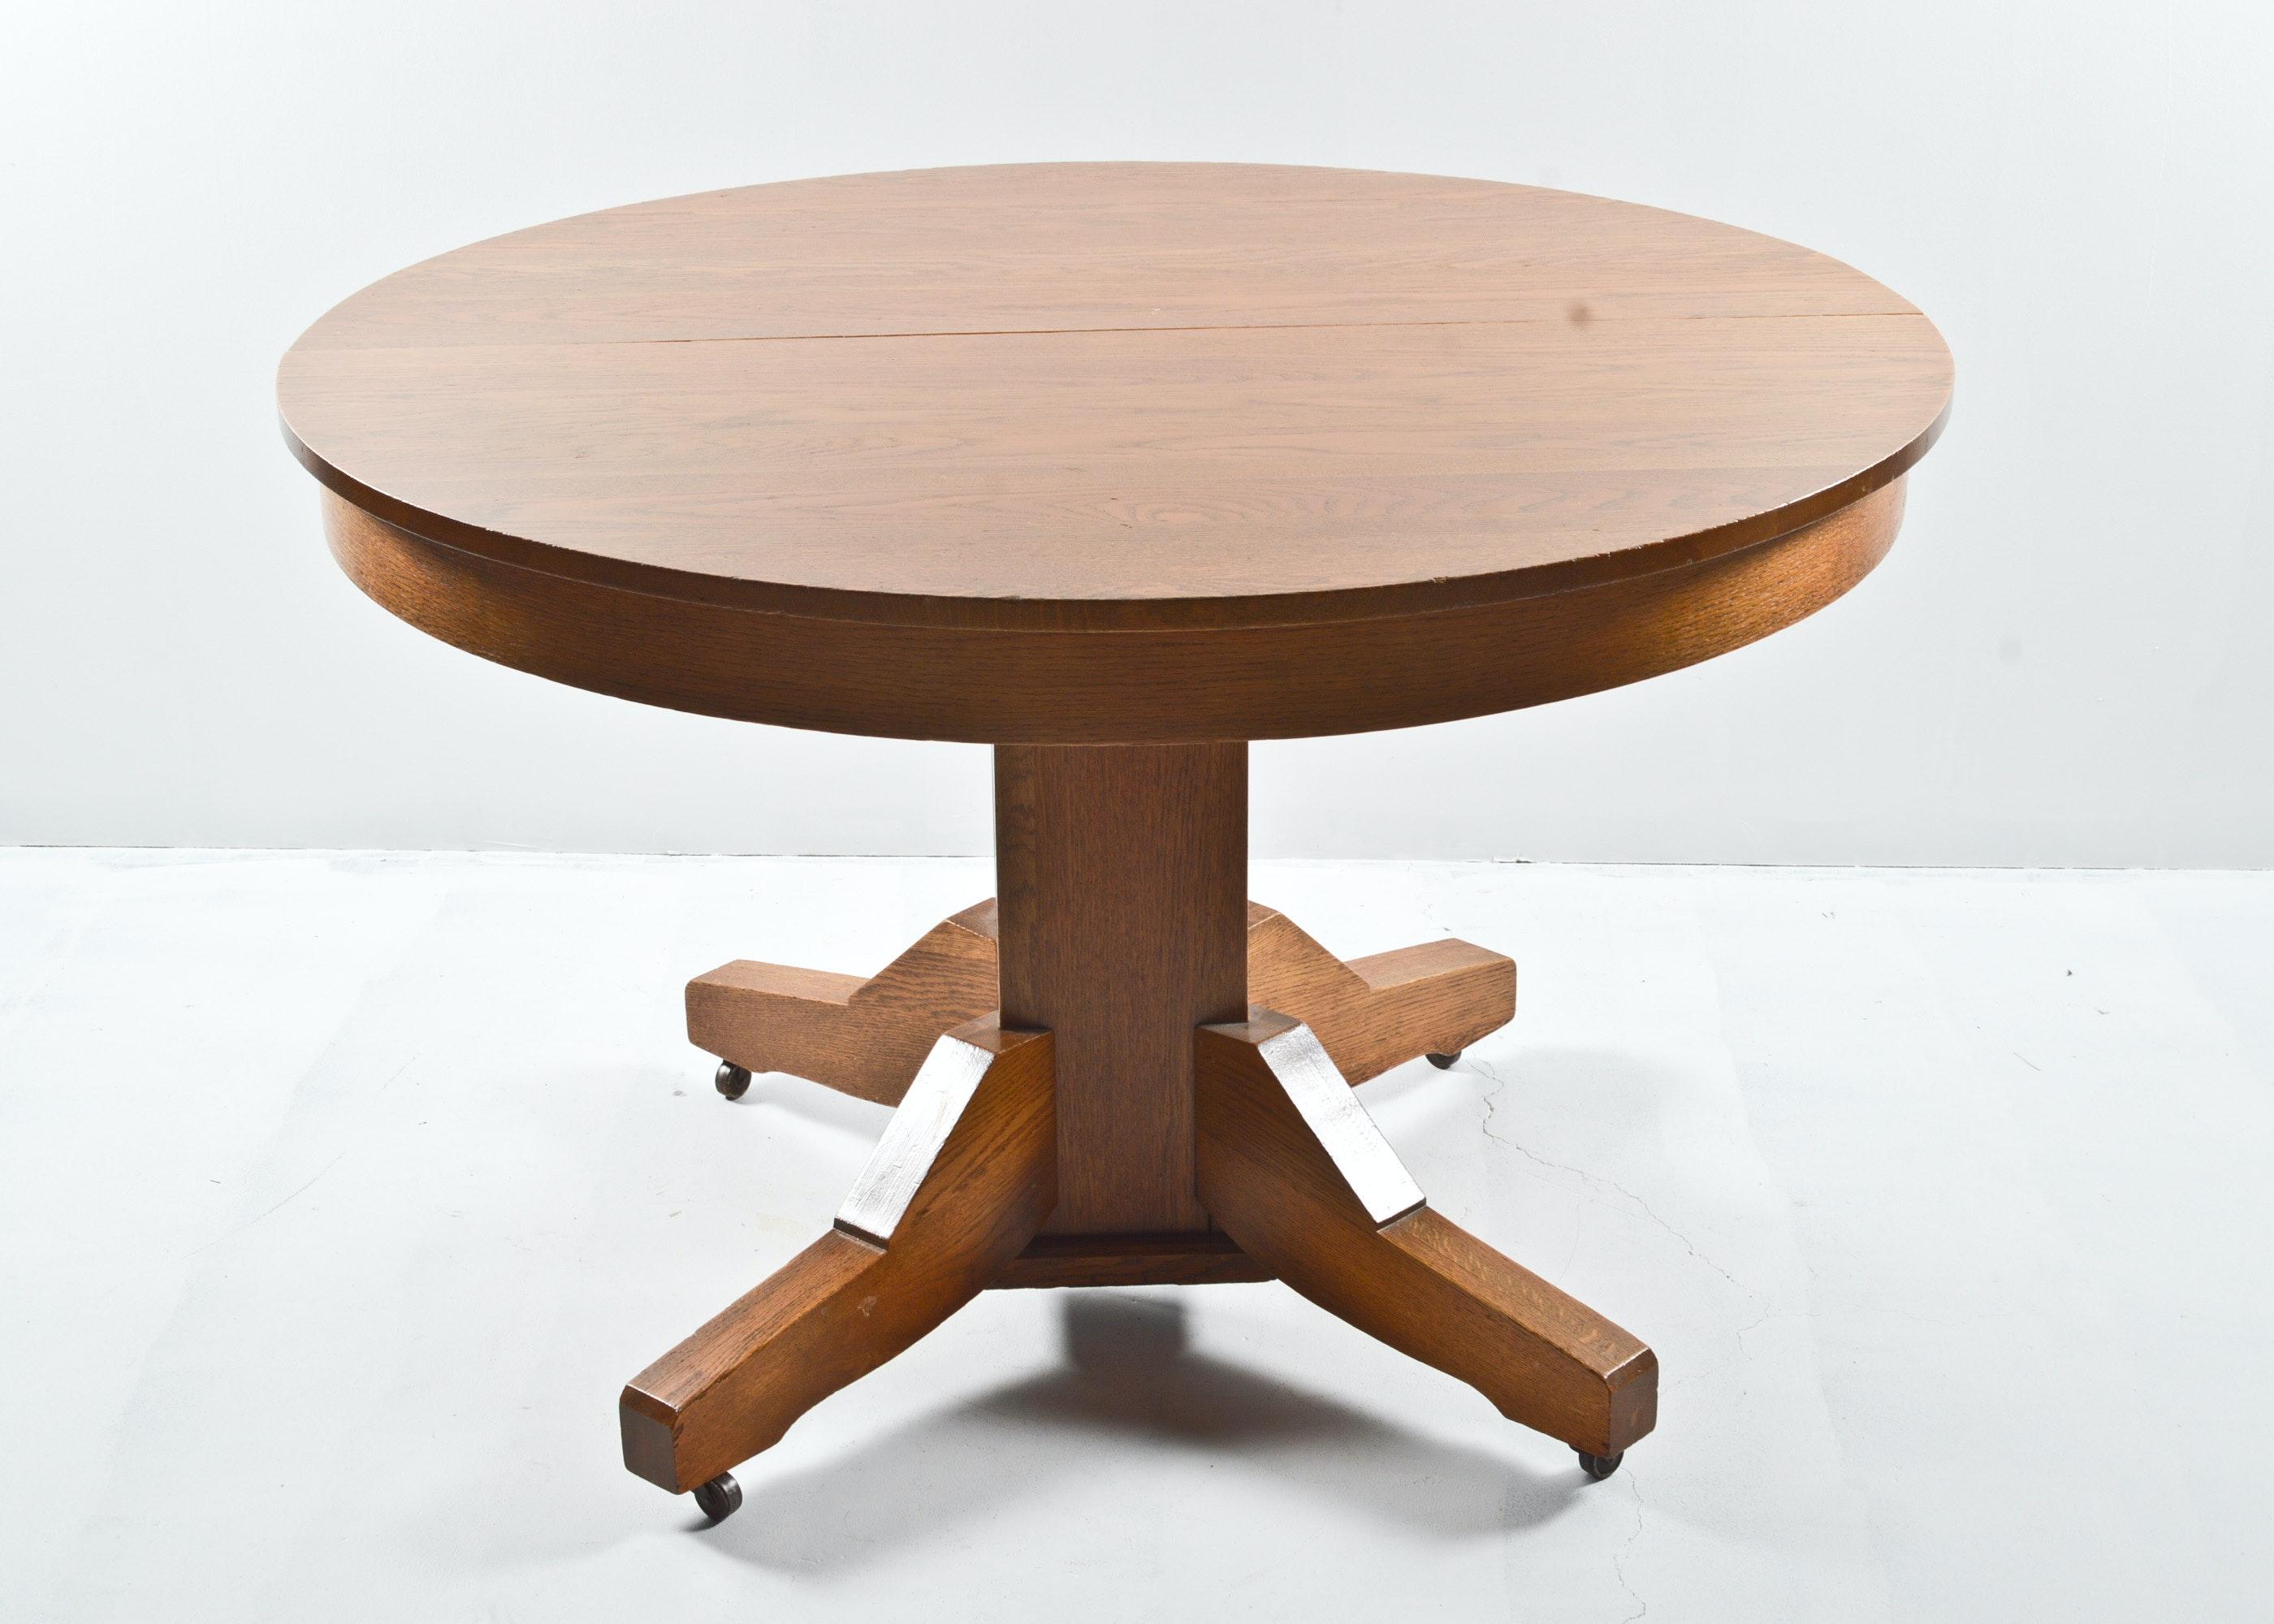 Mission Style Quarter Sawn Oak Round Dining Table on  : DSC03786jpgixlibrb 11 from www.ebth.com size 880 x 906 jpeg 88kB